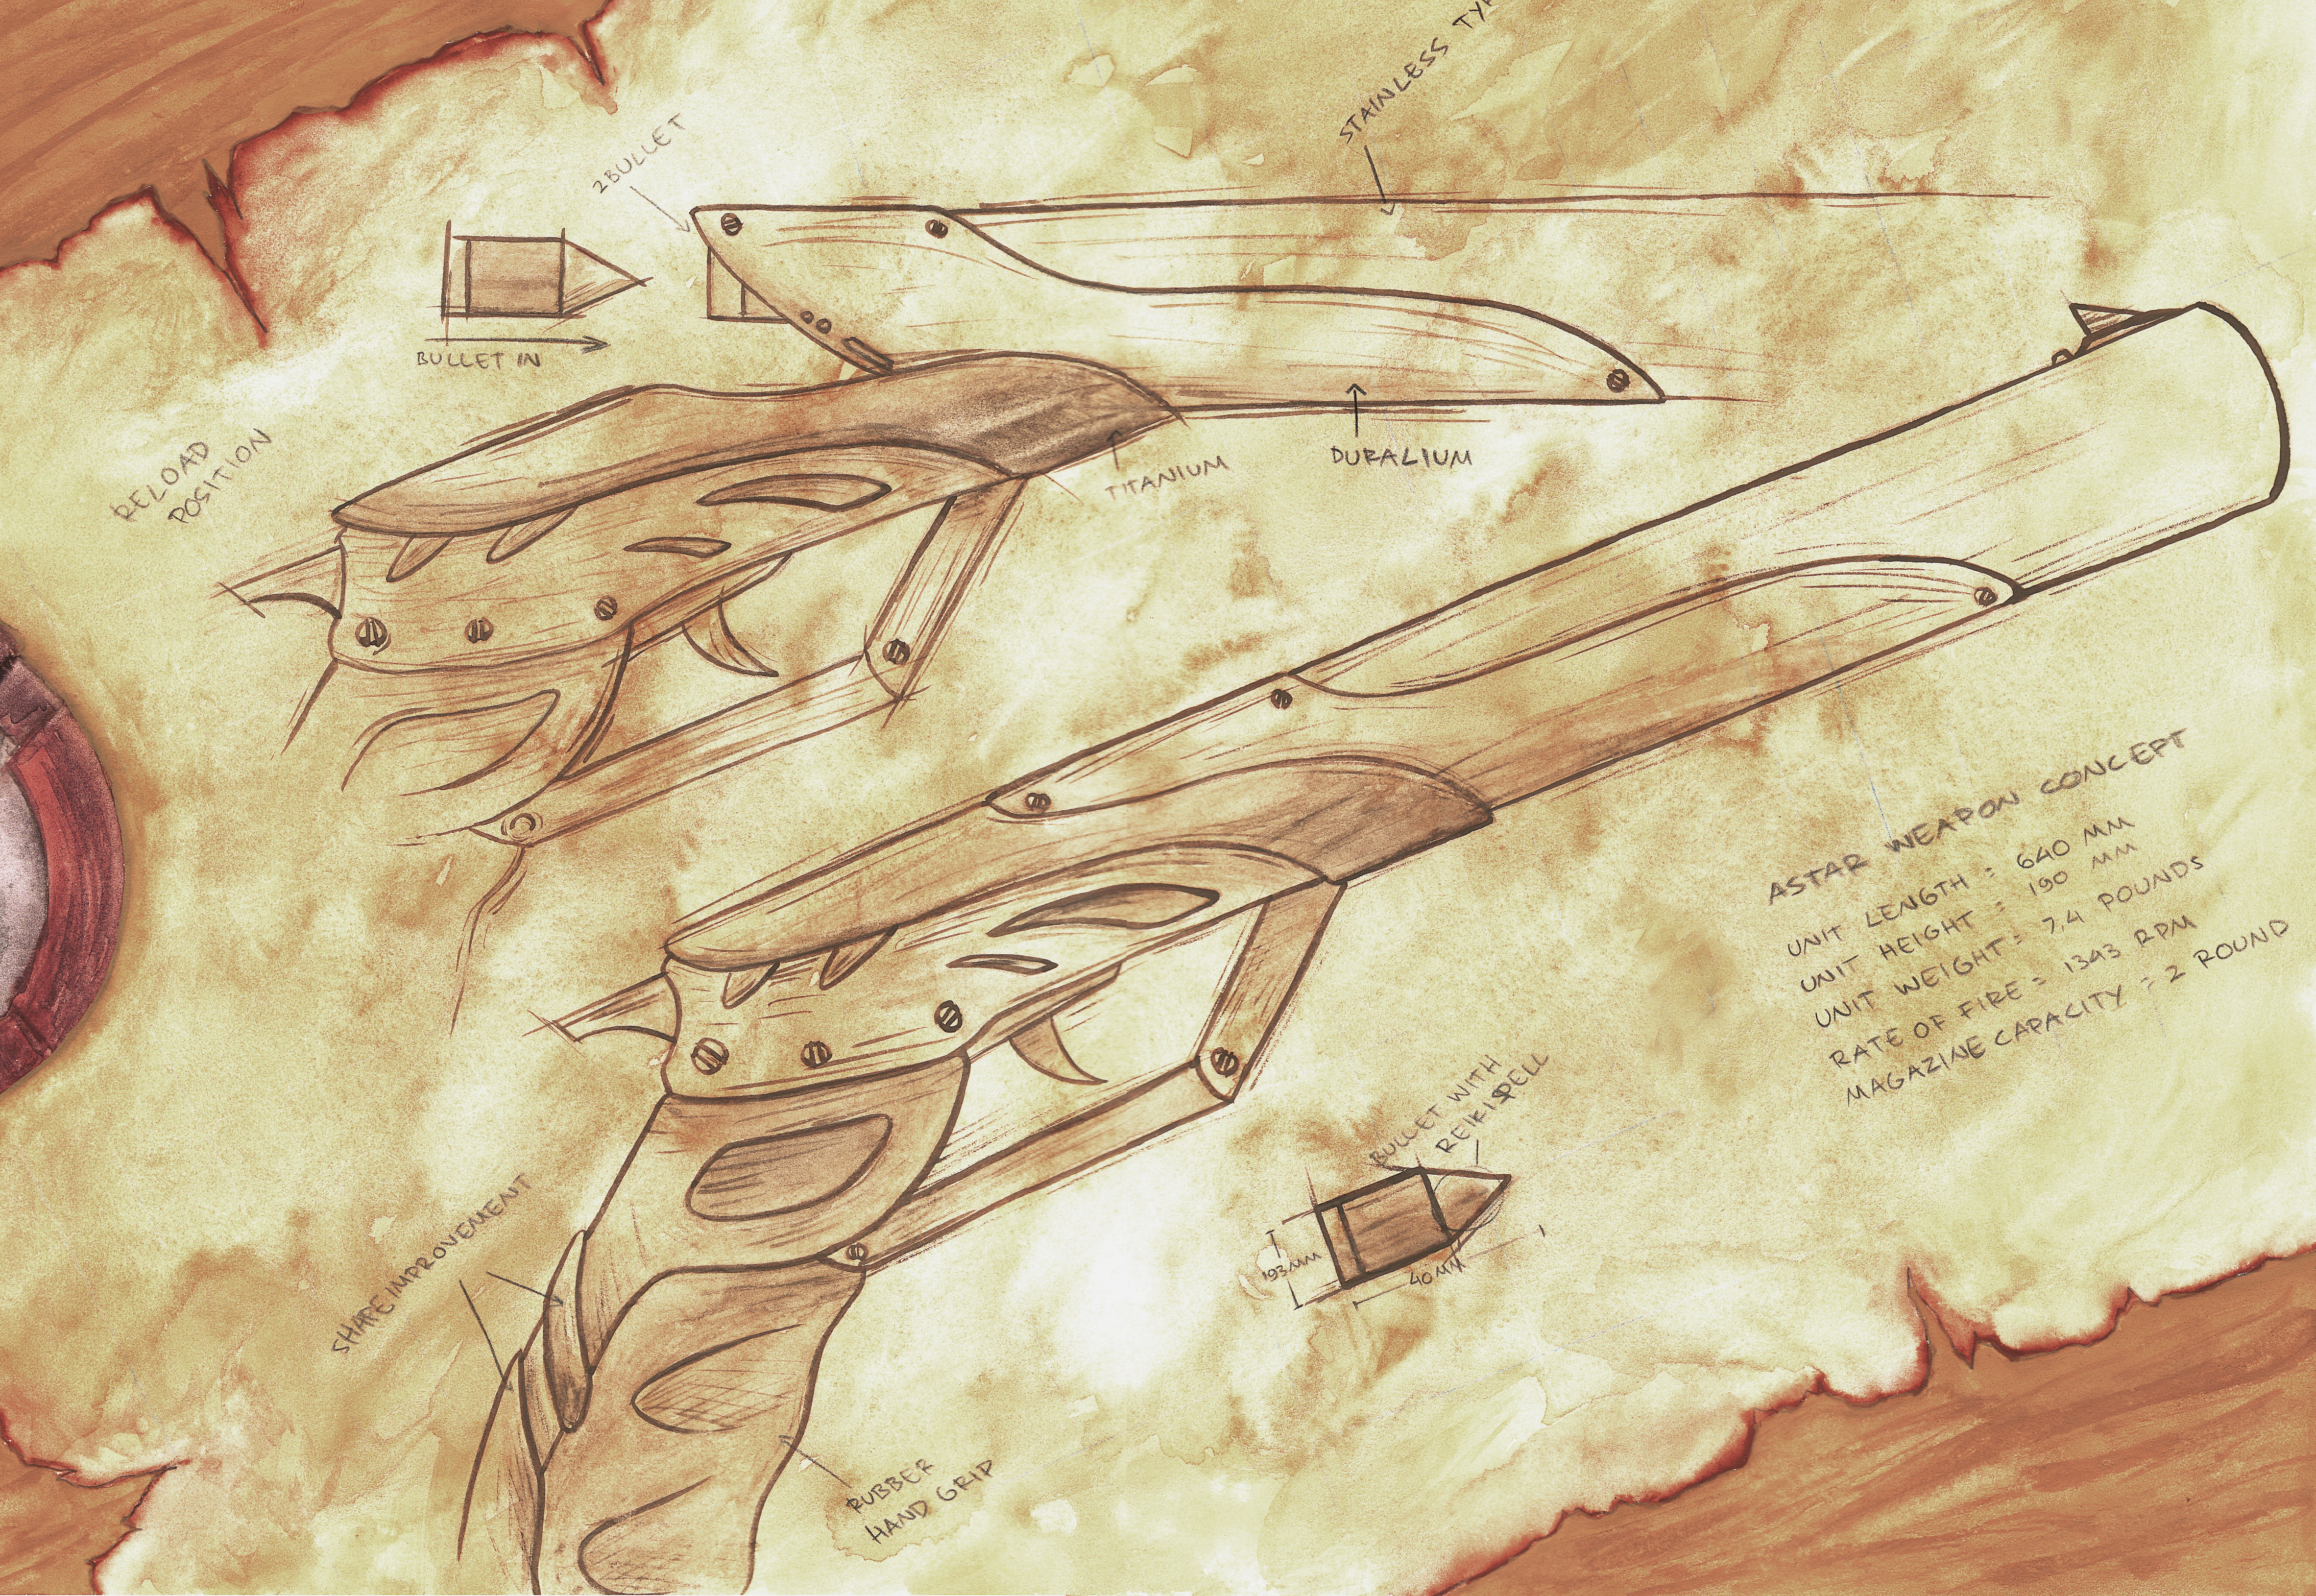 Drawn weapon historical Retro artistic human  art